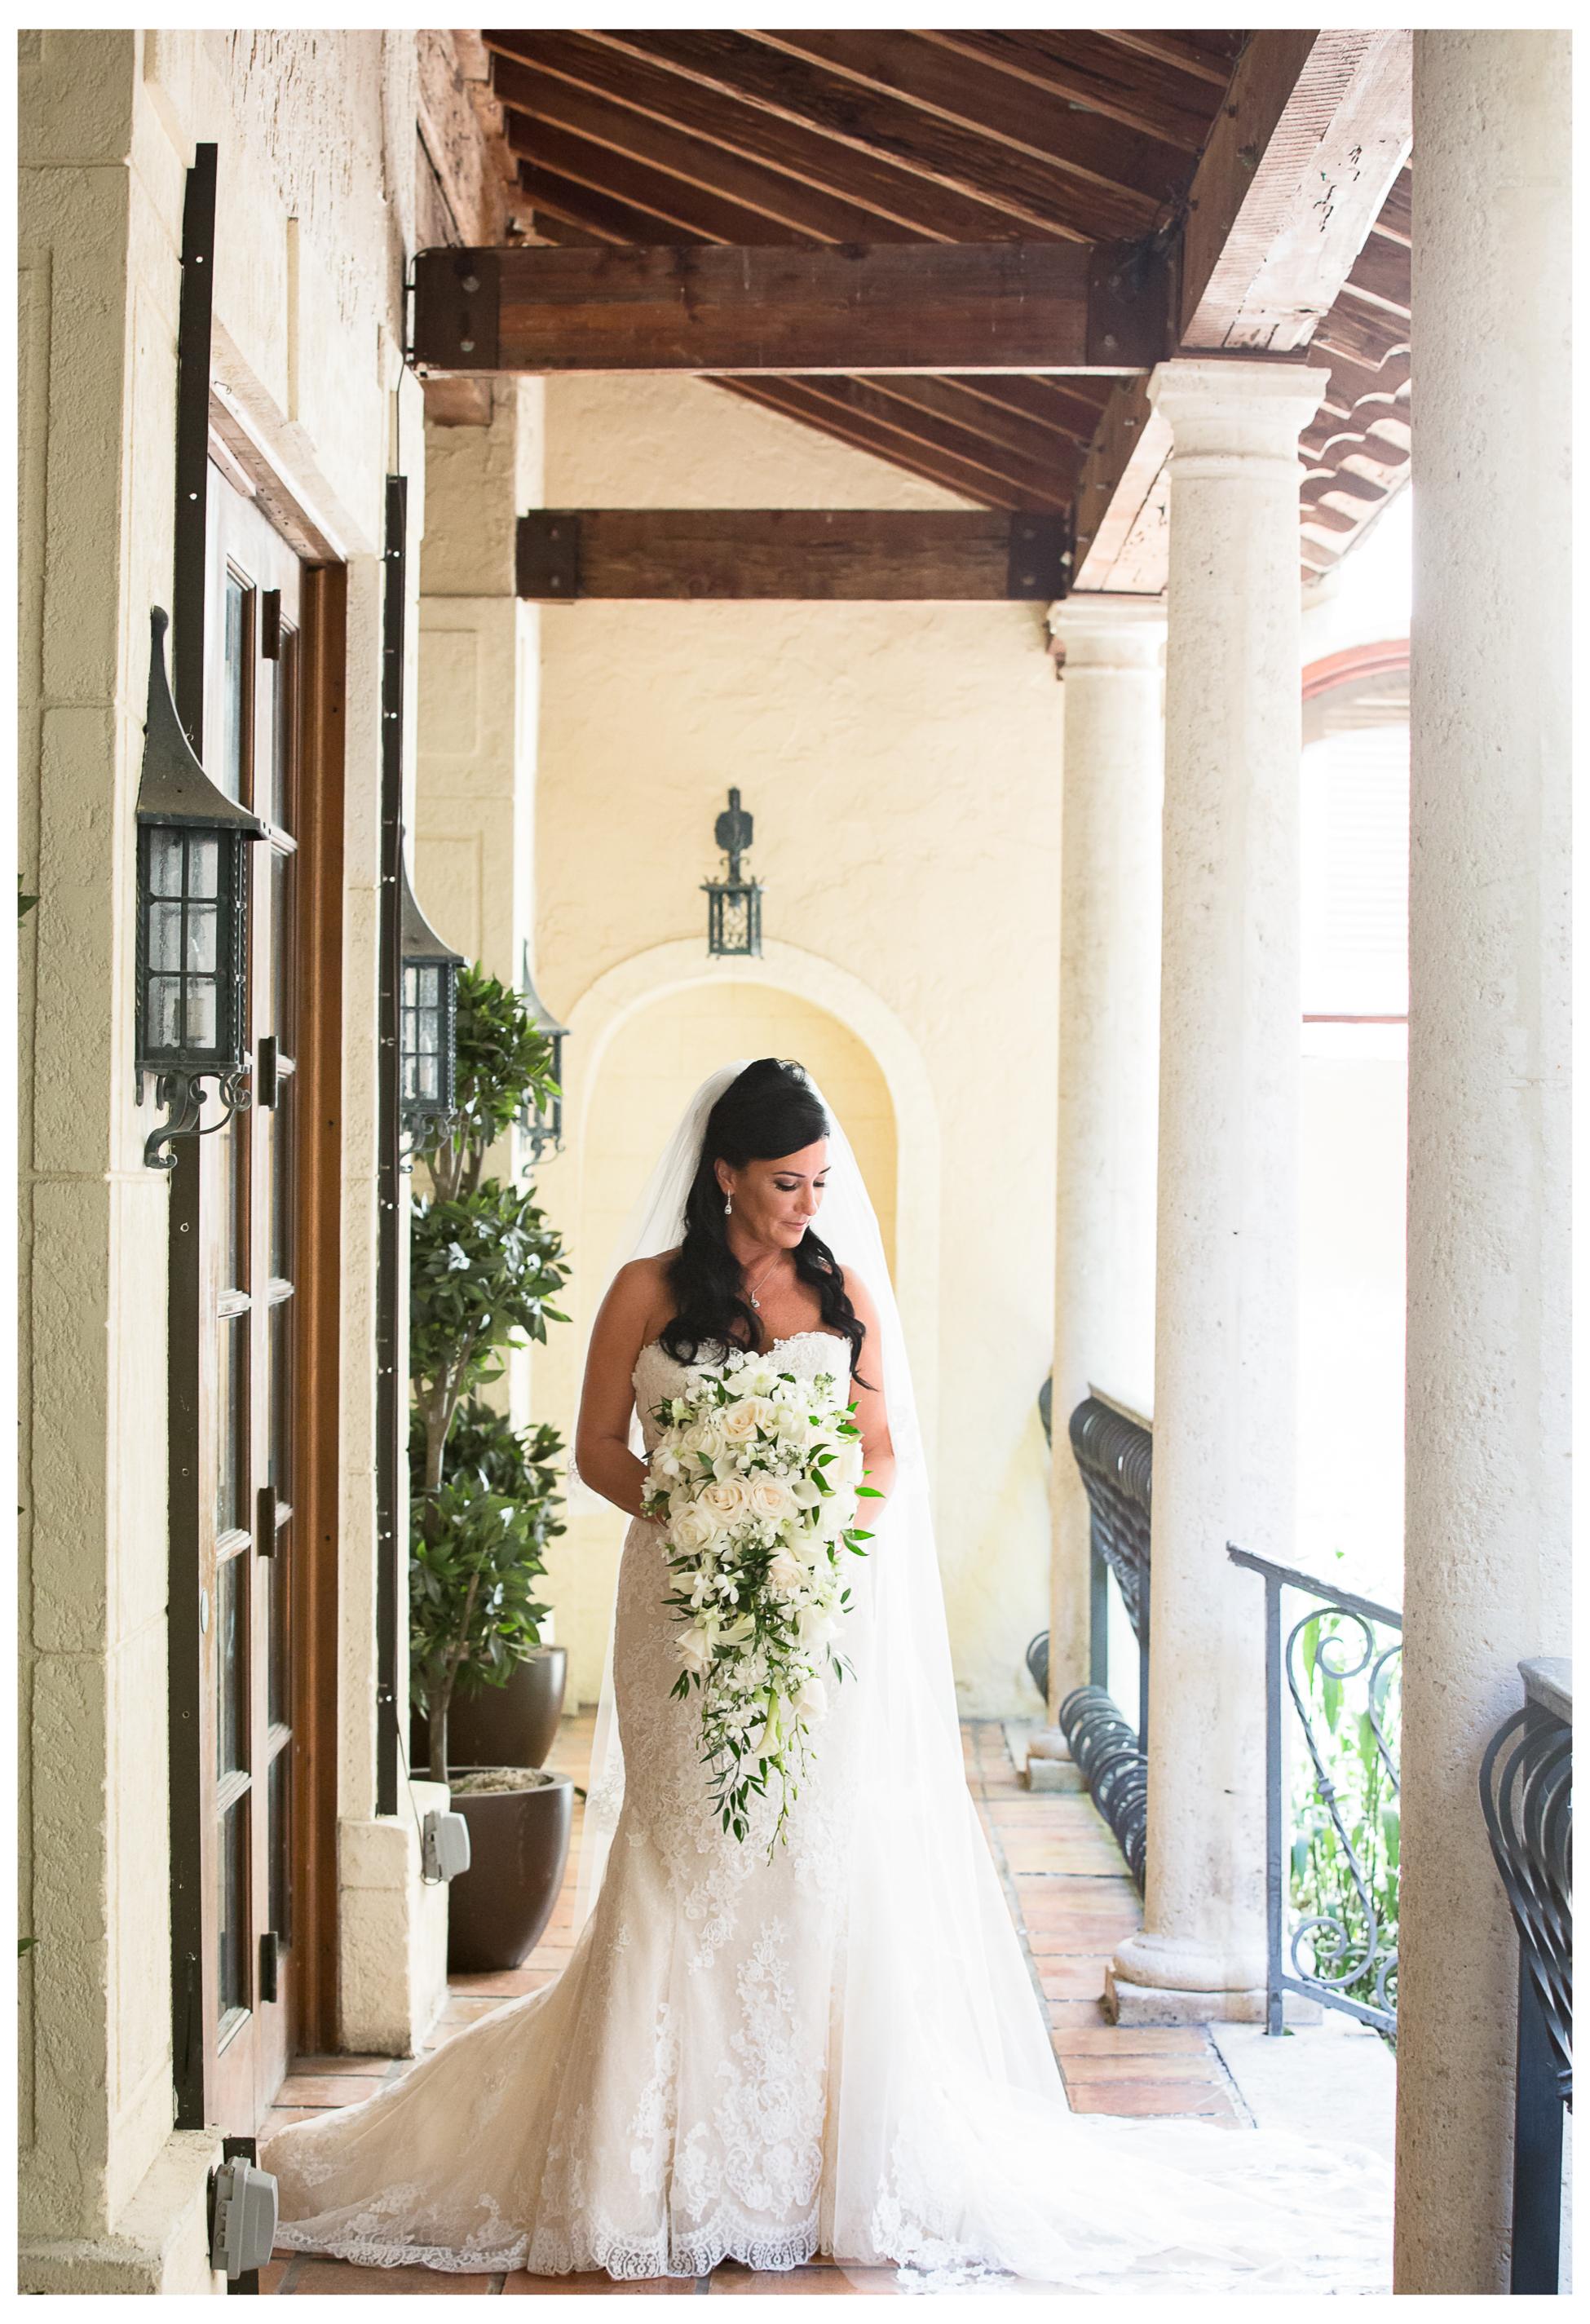 Benvenuto_Boynton_Beach_Wedding_Christine_and Doug_Married 2.jpg